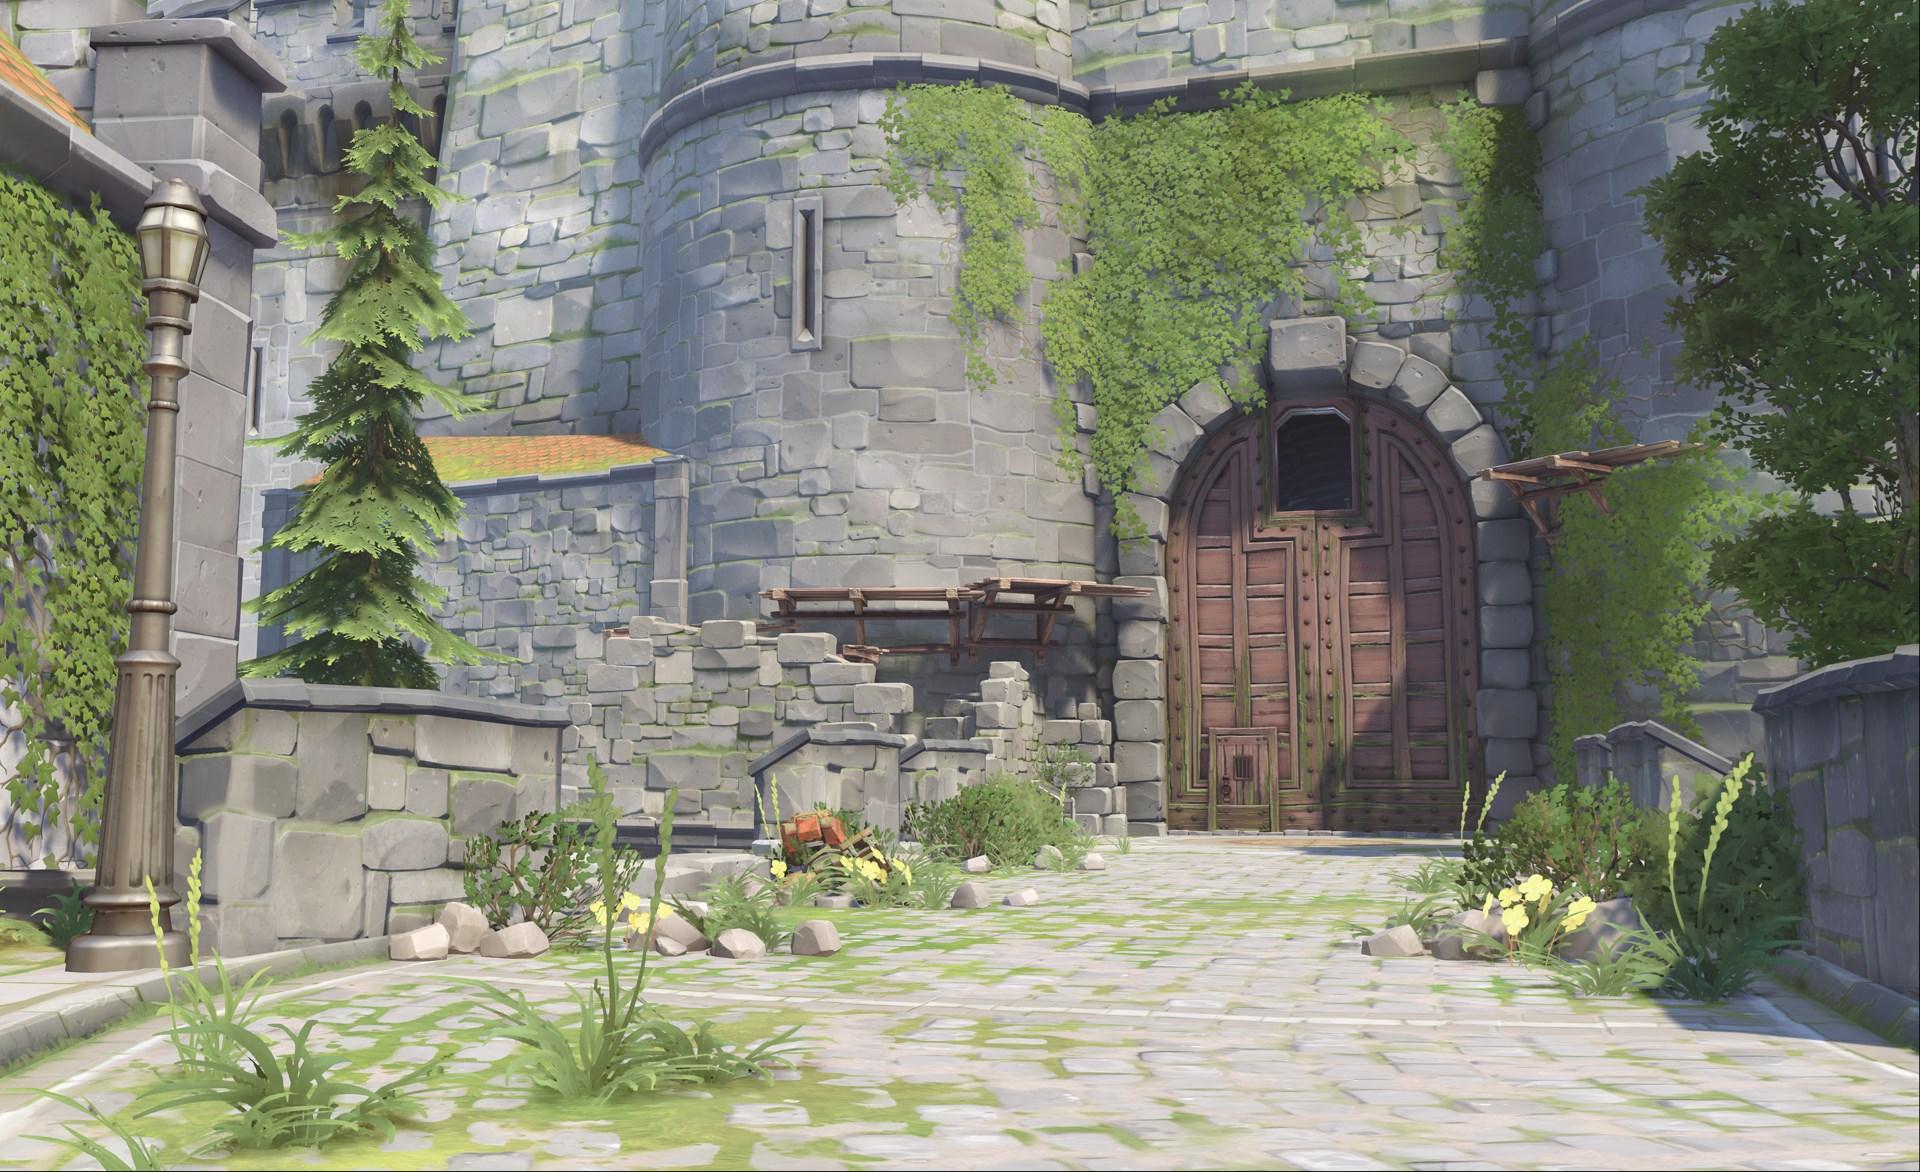 Eichenwalde là bản đồ thứ 13 của Overwatch - Ảnh 03